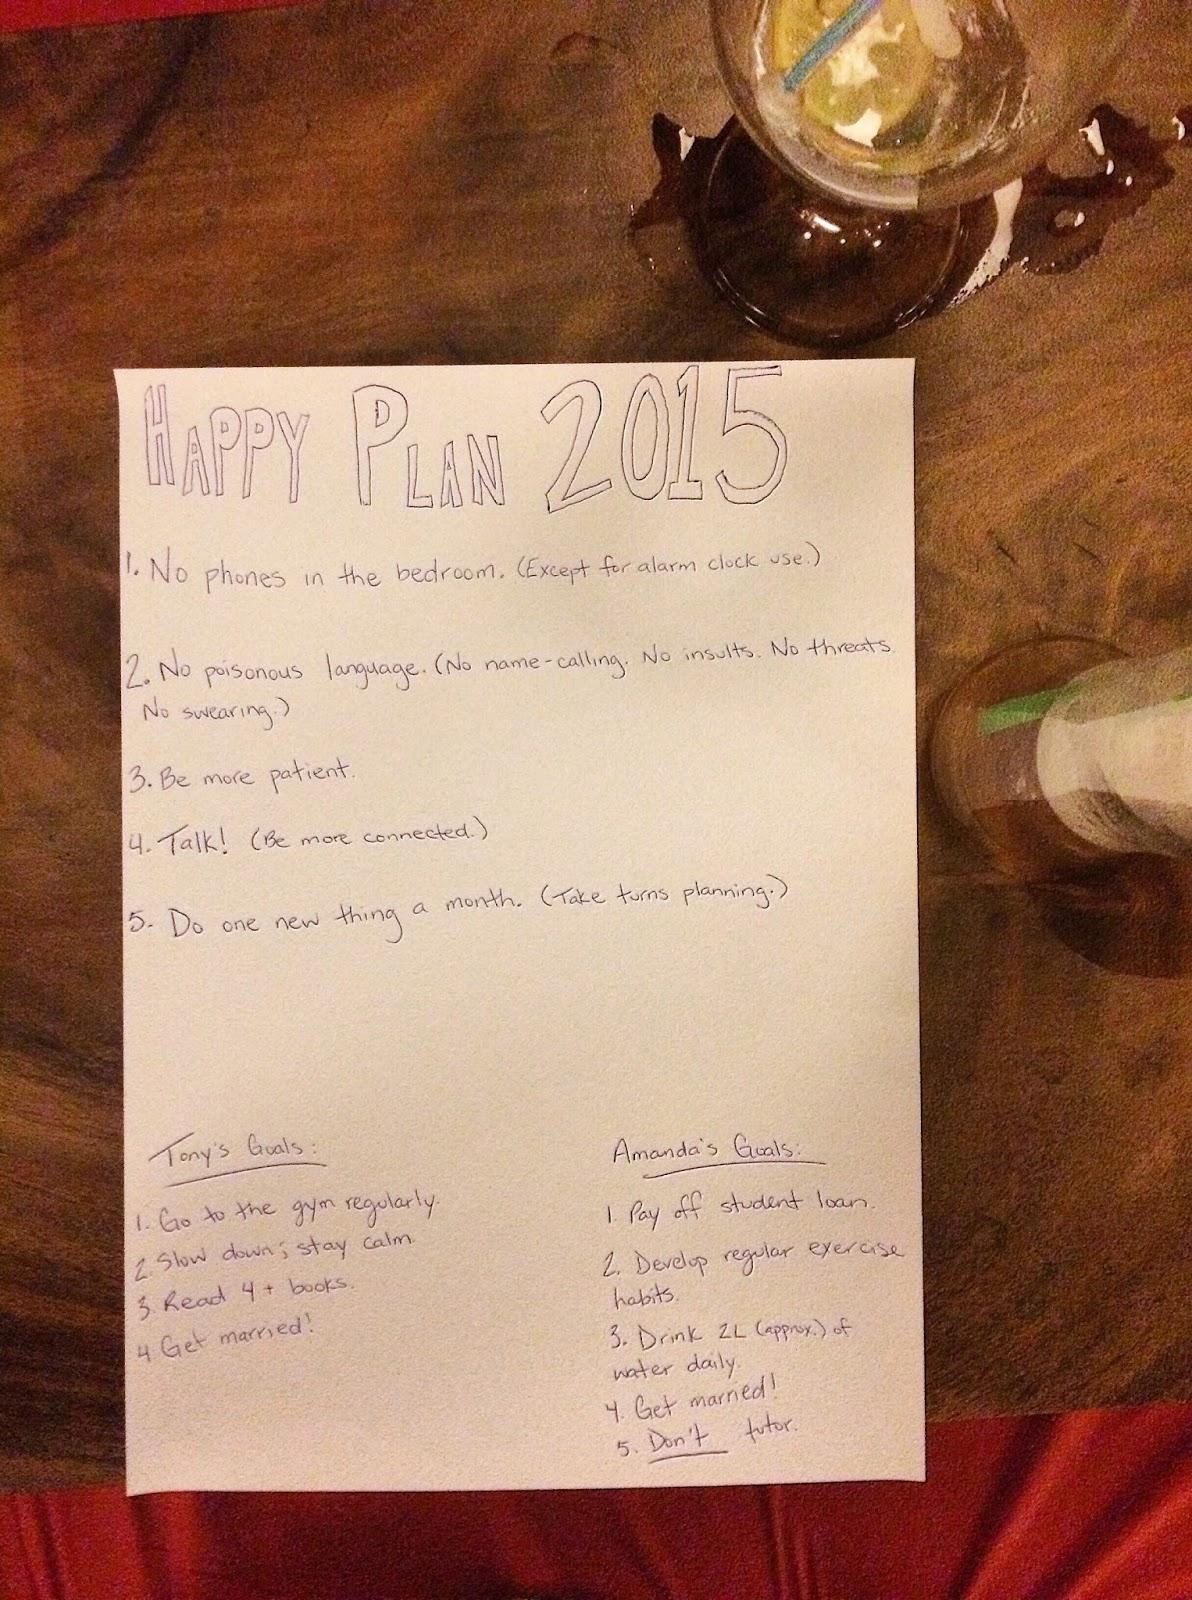 happy plan 2015.